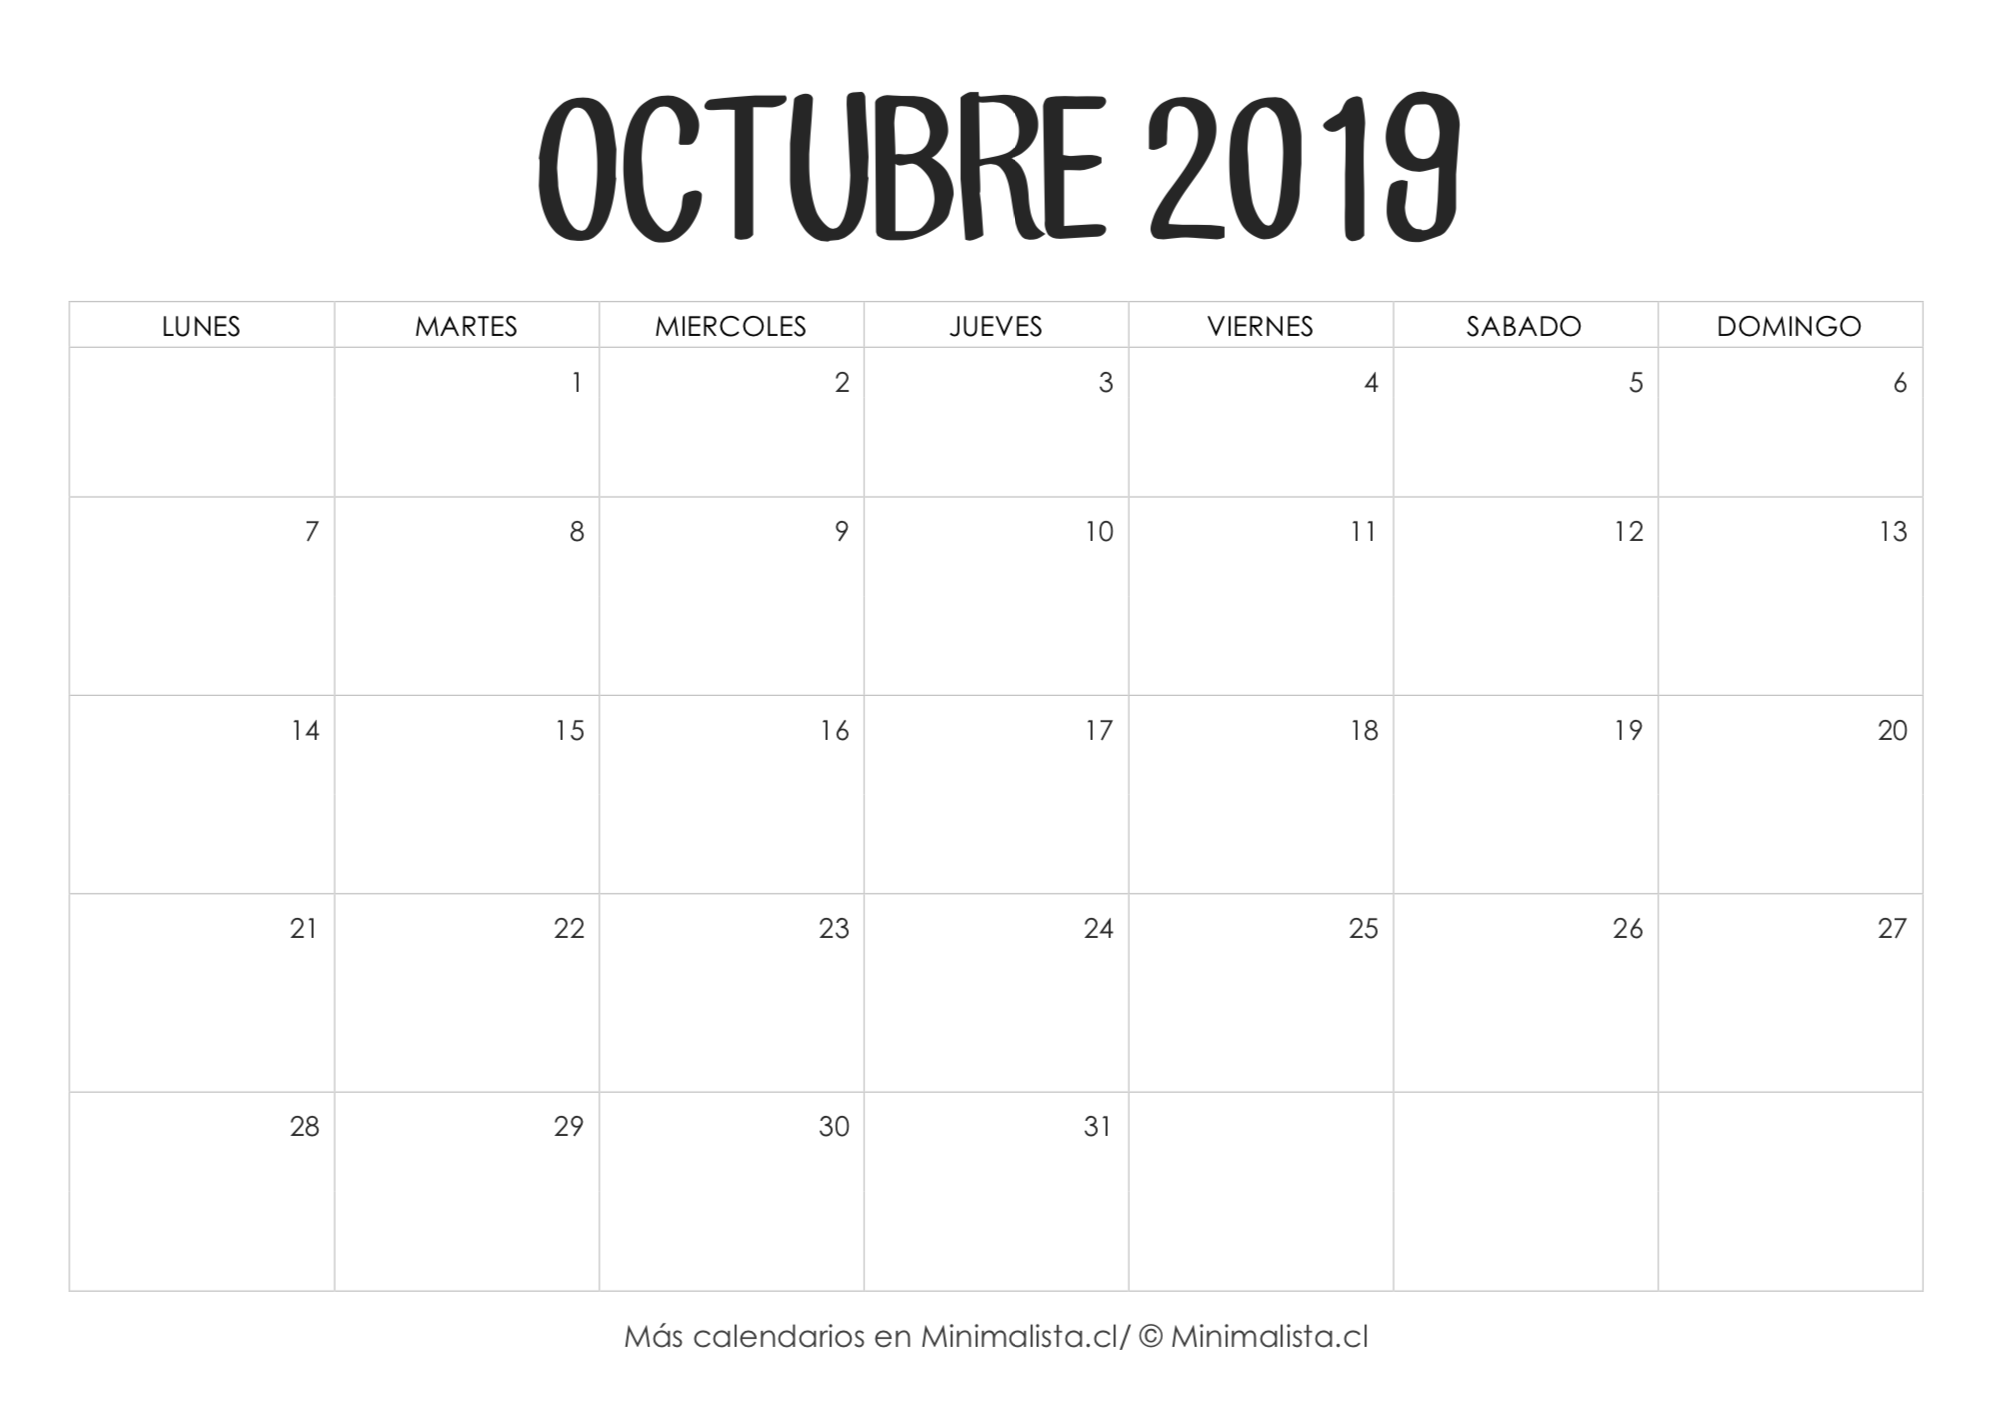 Calendario Mes De Octubre 2020 Para Imprimir.Calendario Octubre 2019 Para Imprimir Manualidades